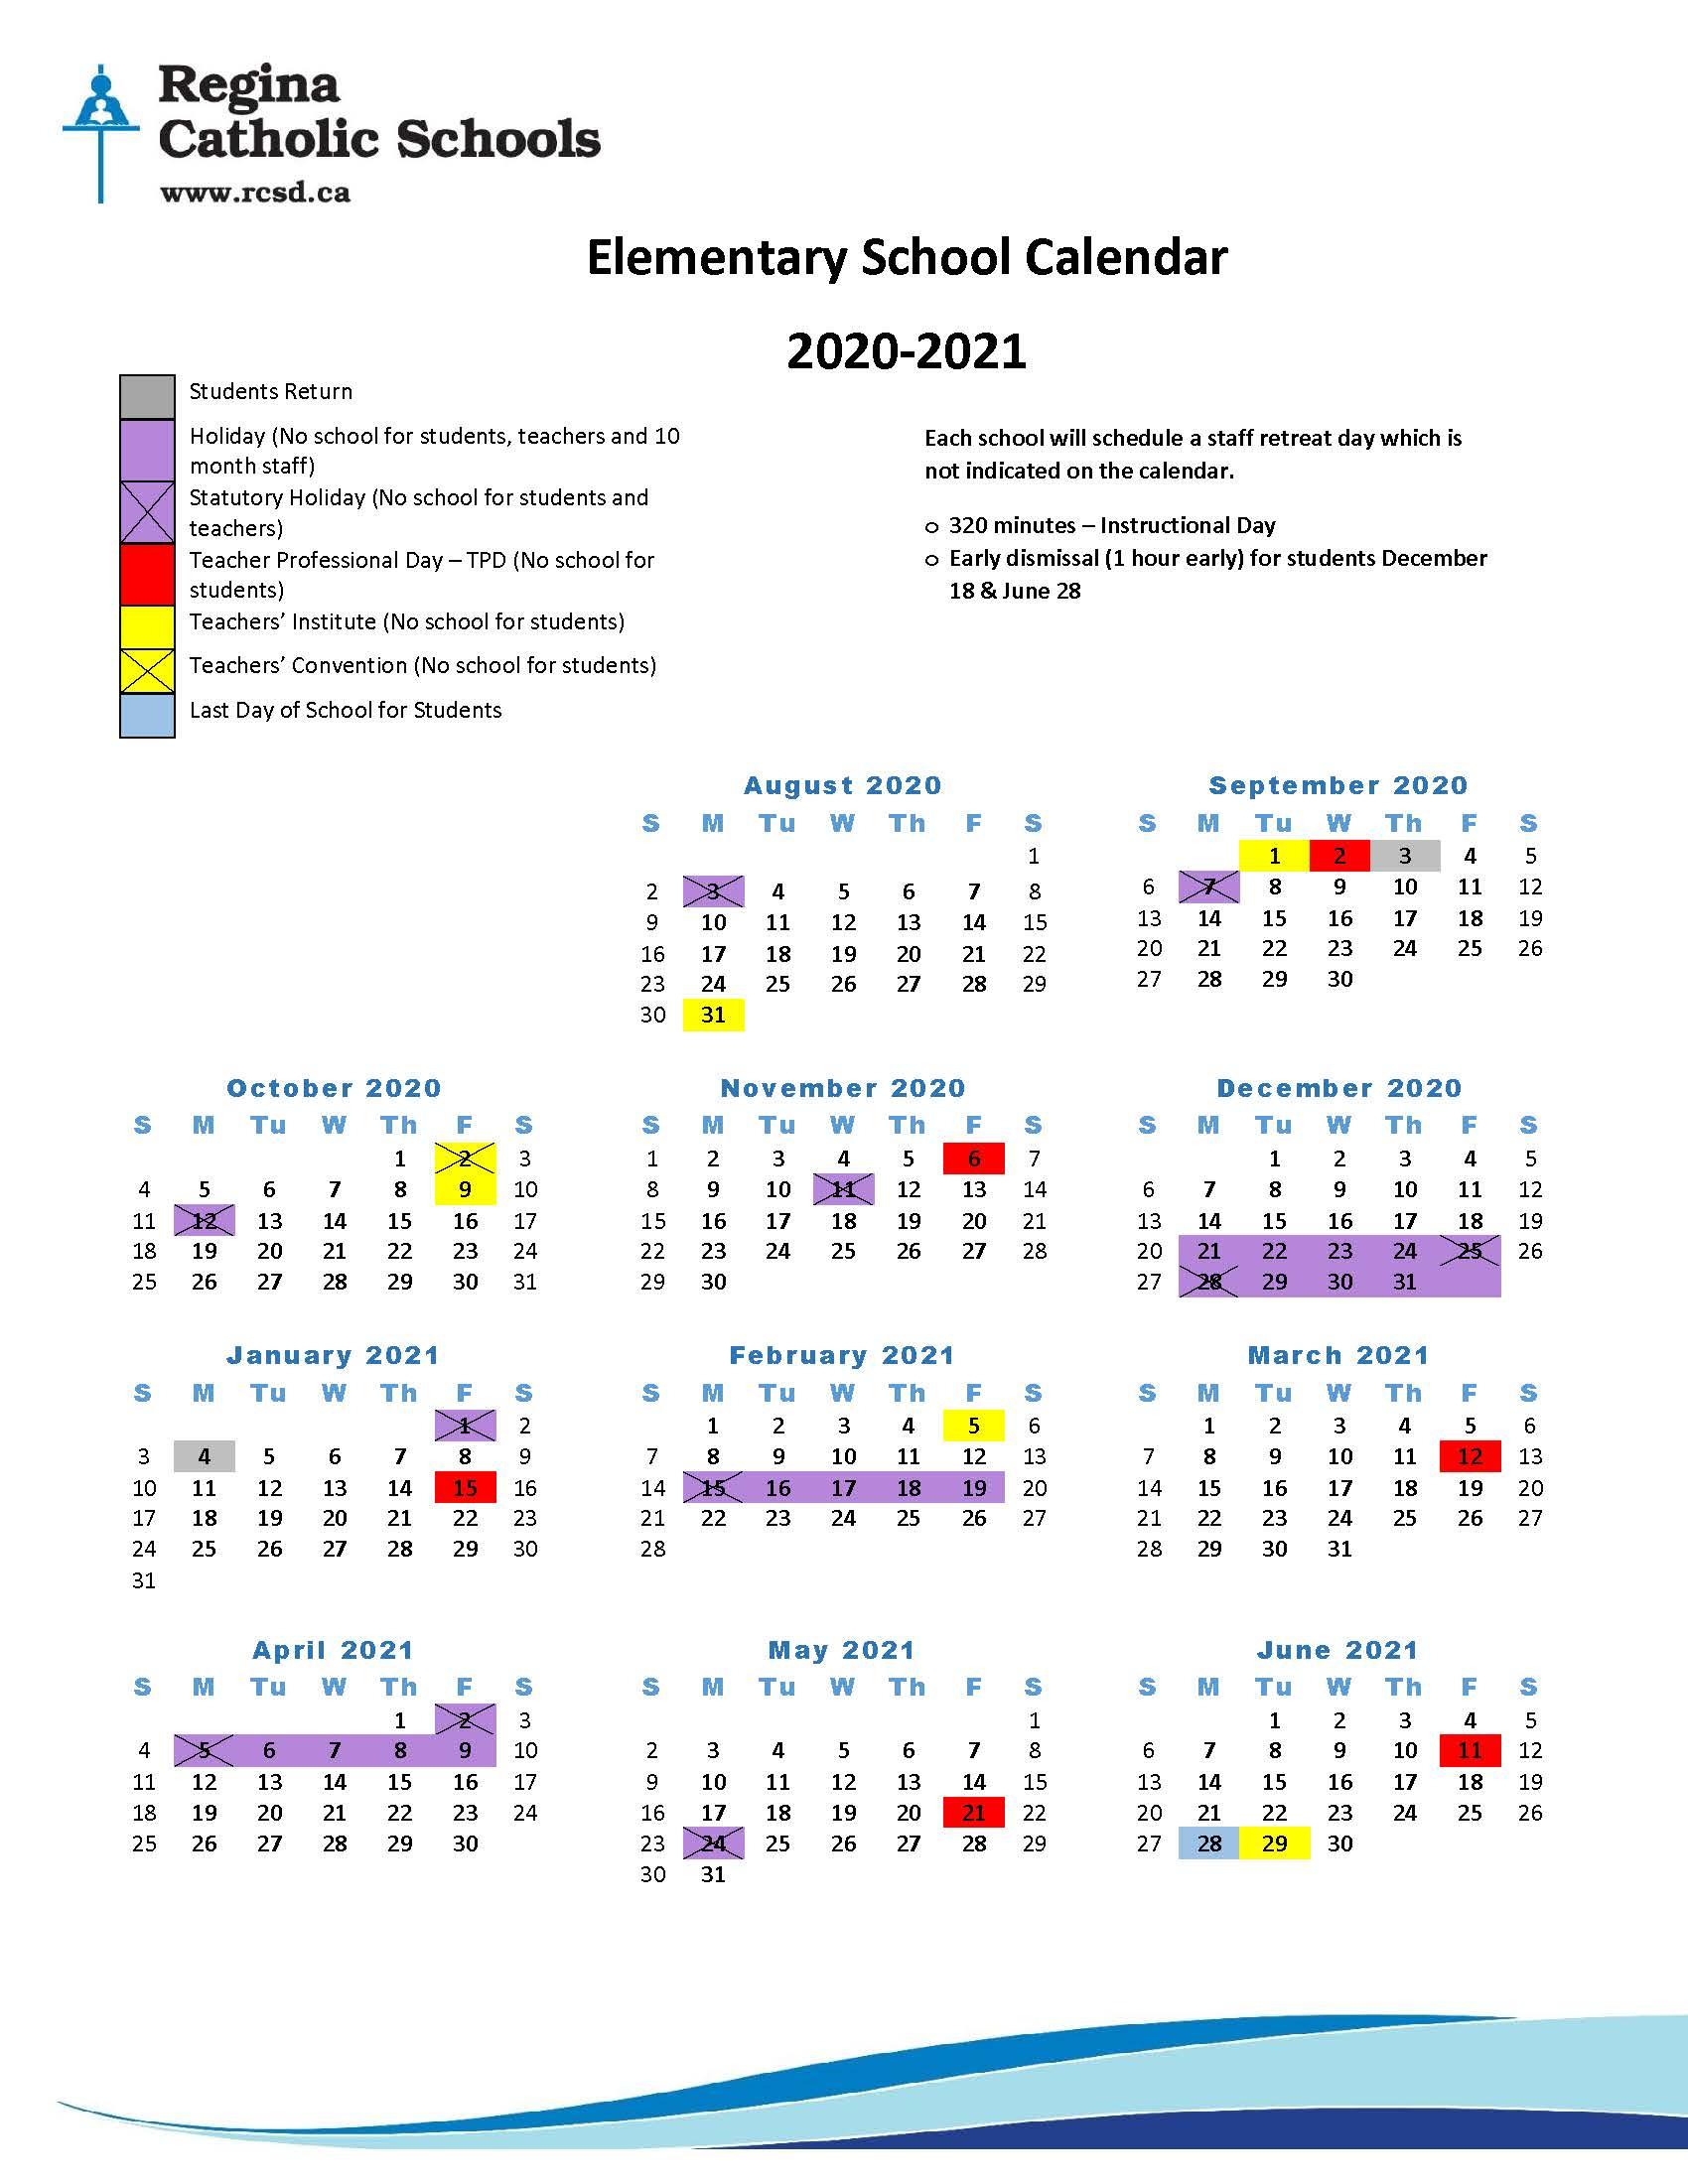 St. Theresa School - St. Theresa School In Las Cruces Public Schools Calendar 2021 20